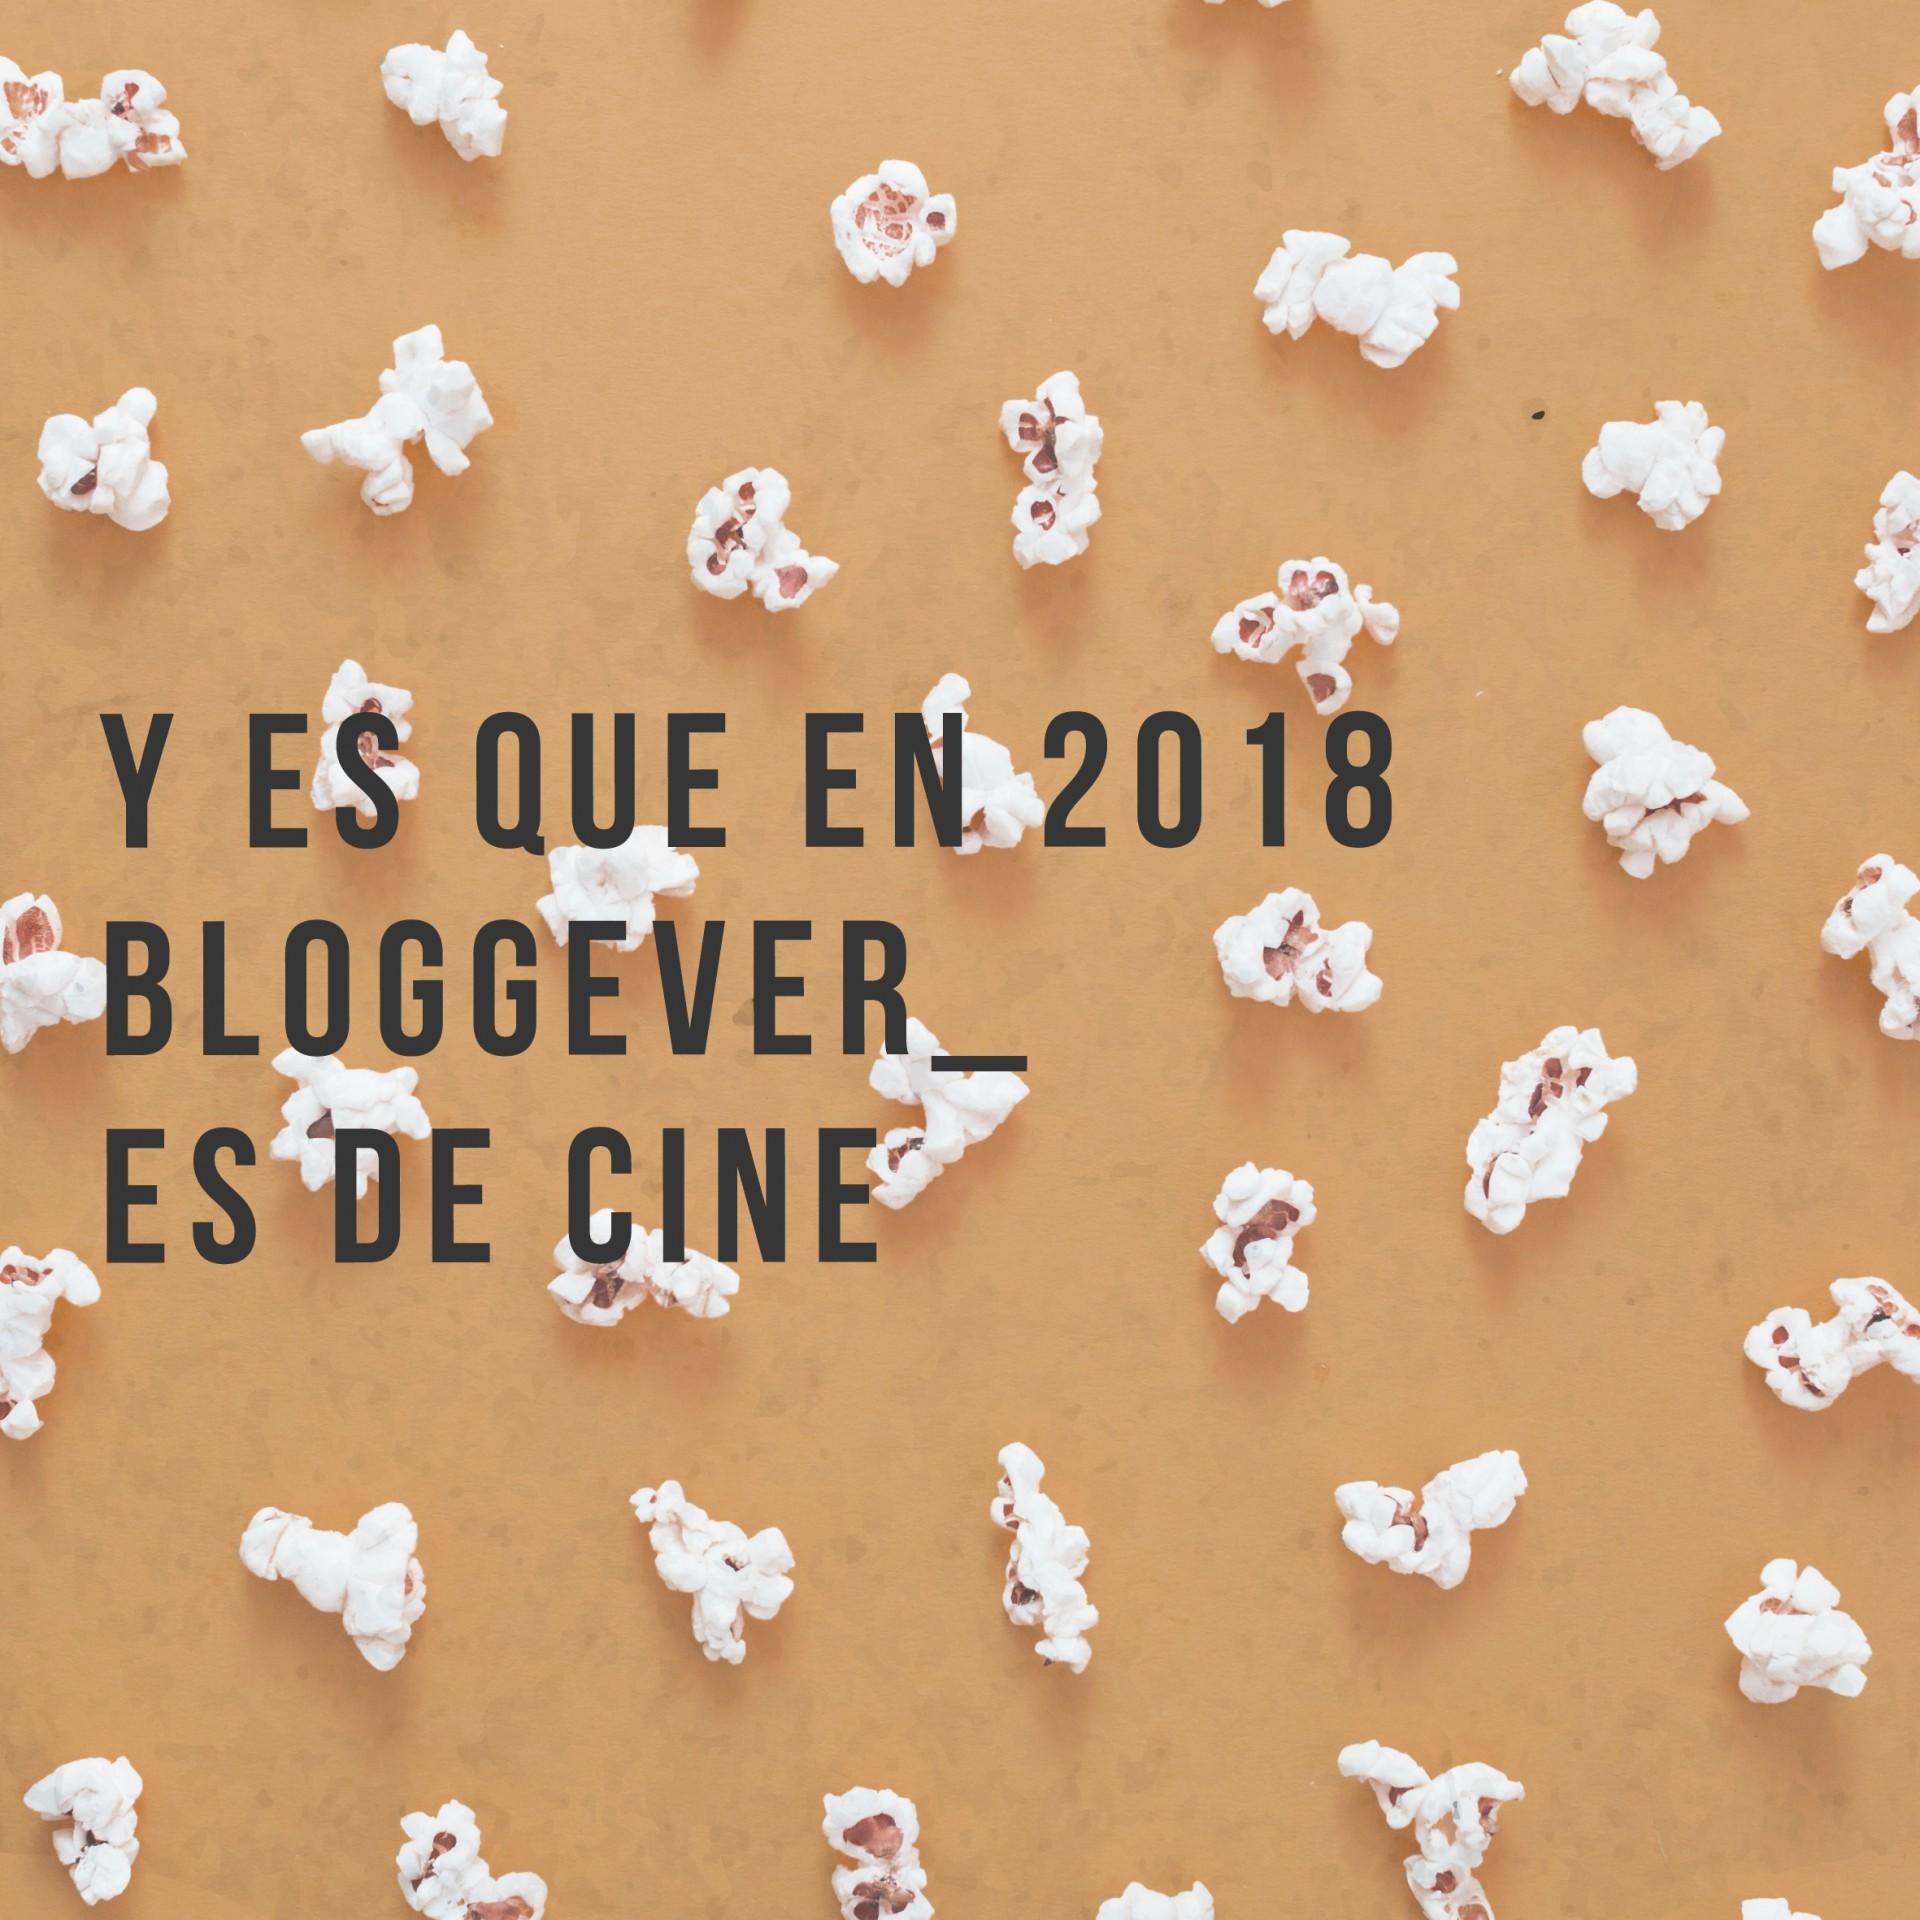 bloggever-18-intuasturias-mdebenito-diseño-rrss-web-01